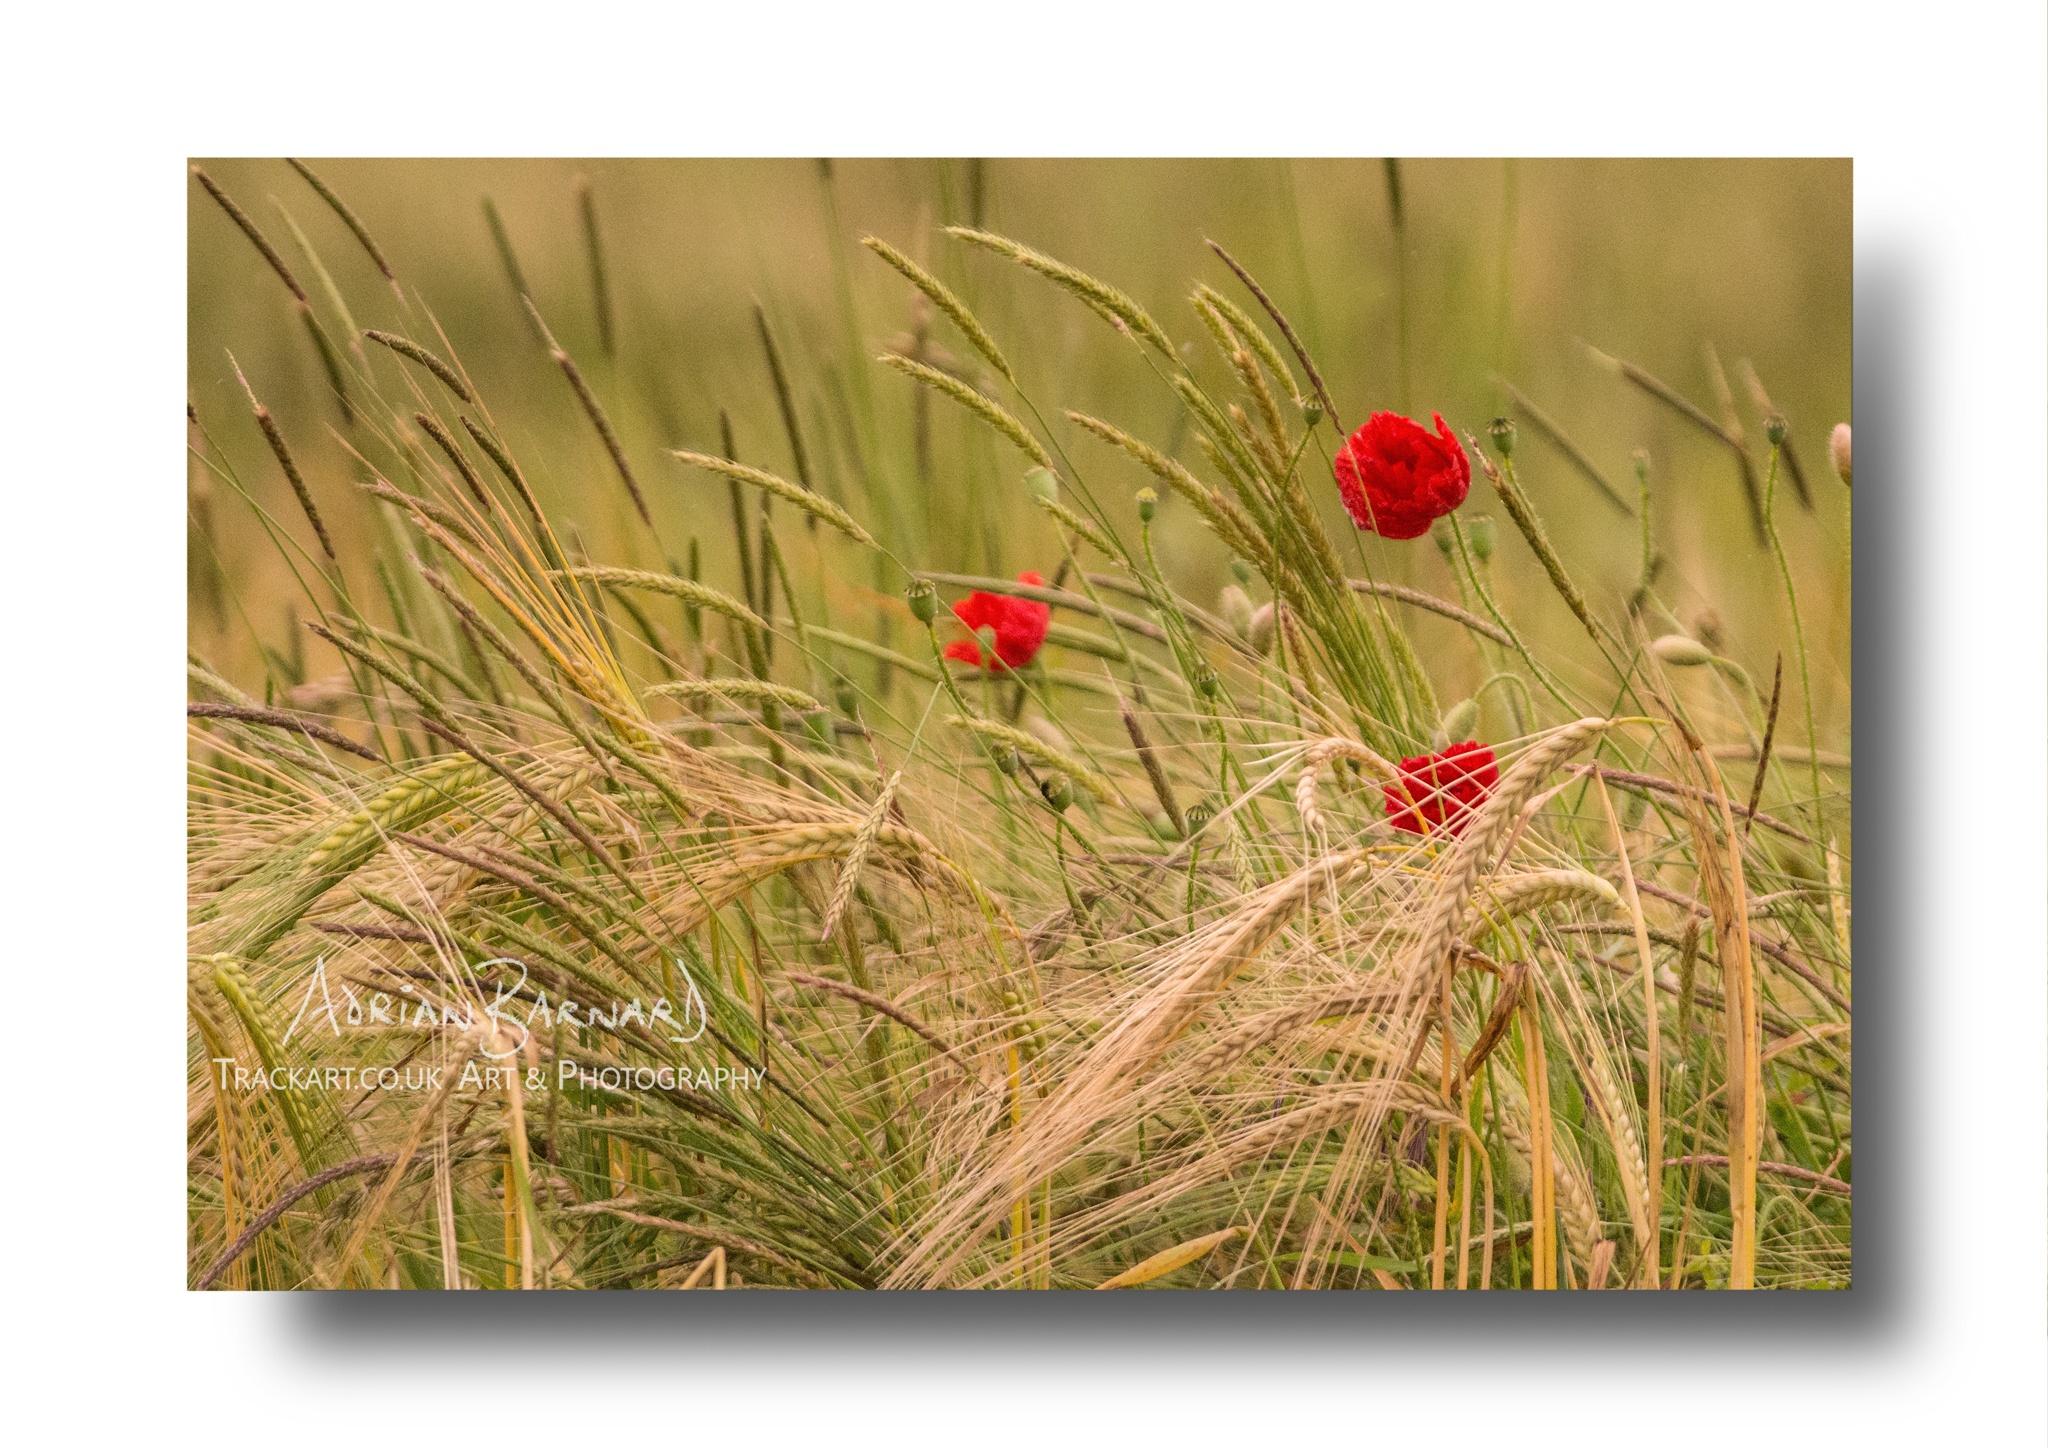 Poppies in Cornfield by Adrian Barnard